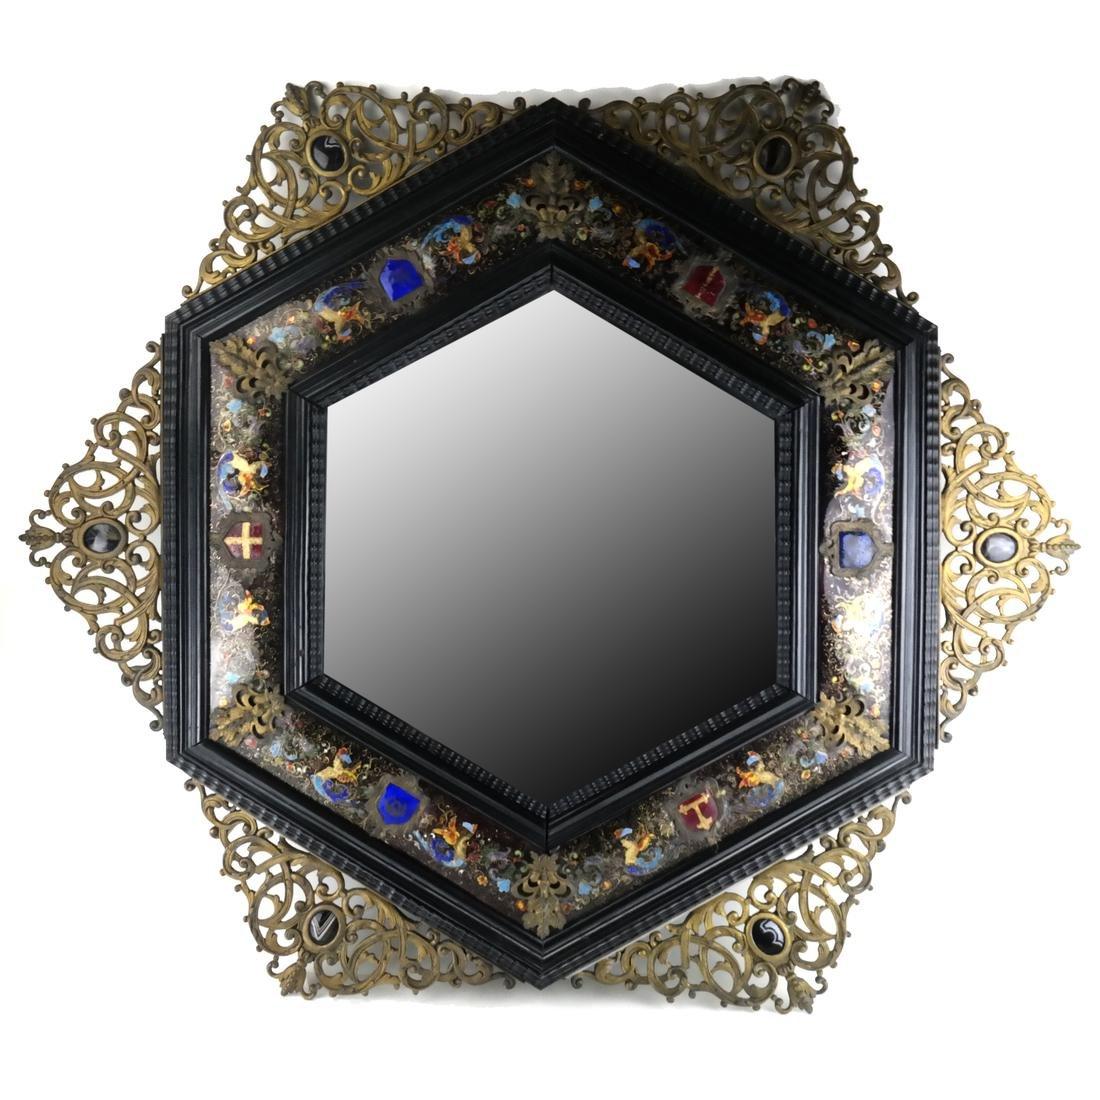 Antique English Enamel and Brass Hexagonal Mirror